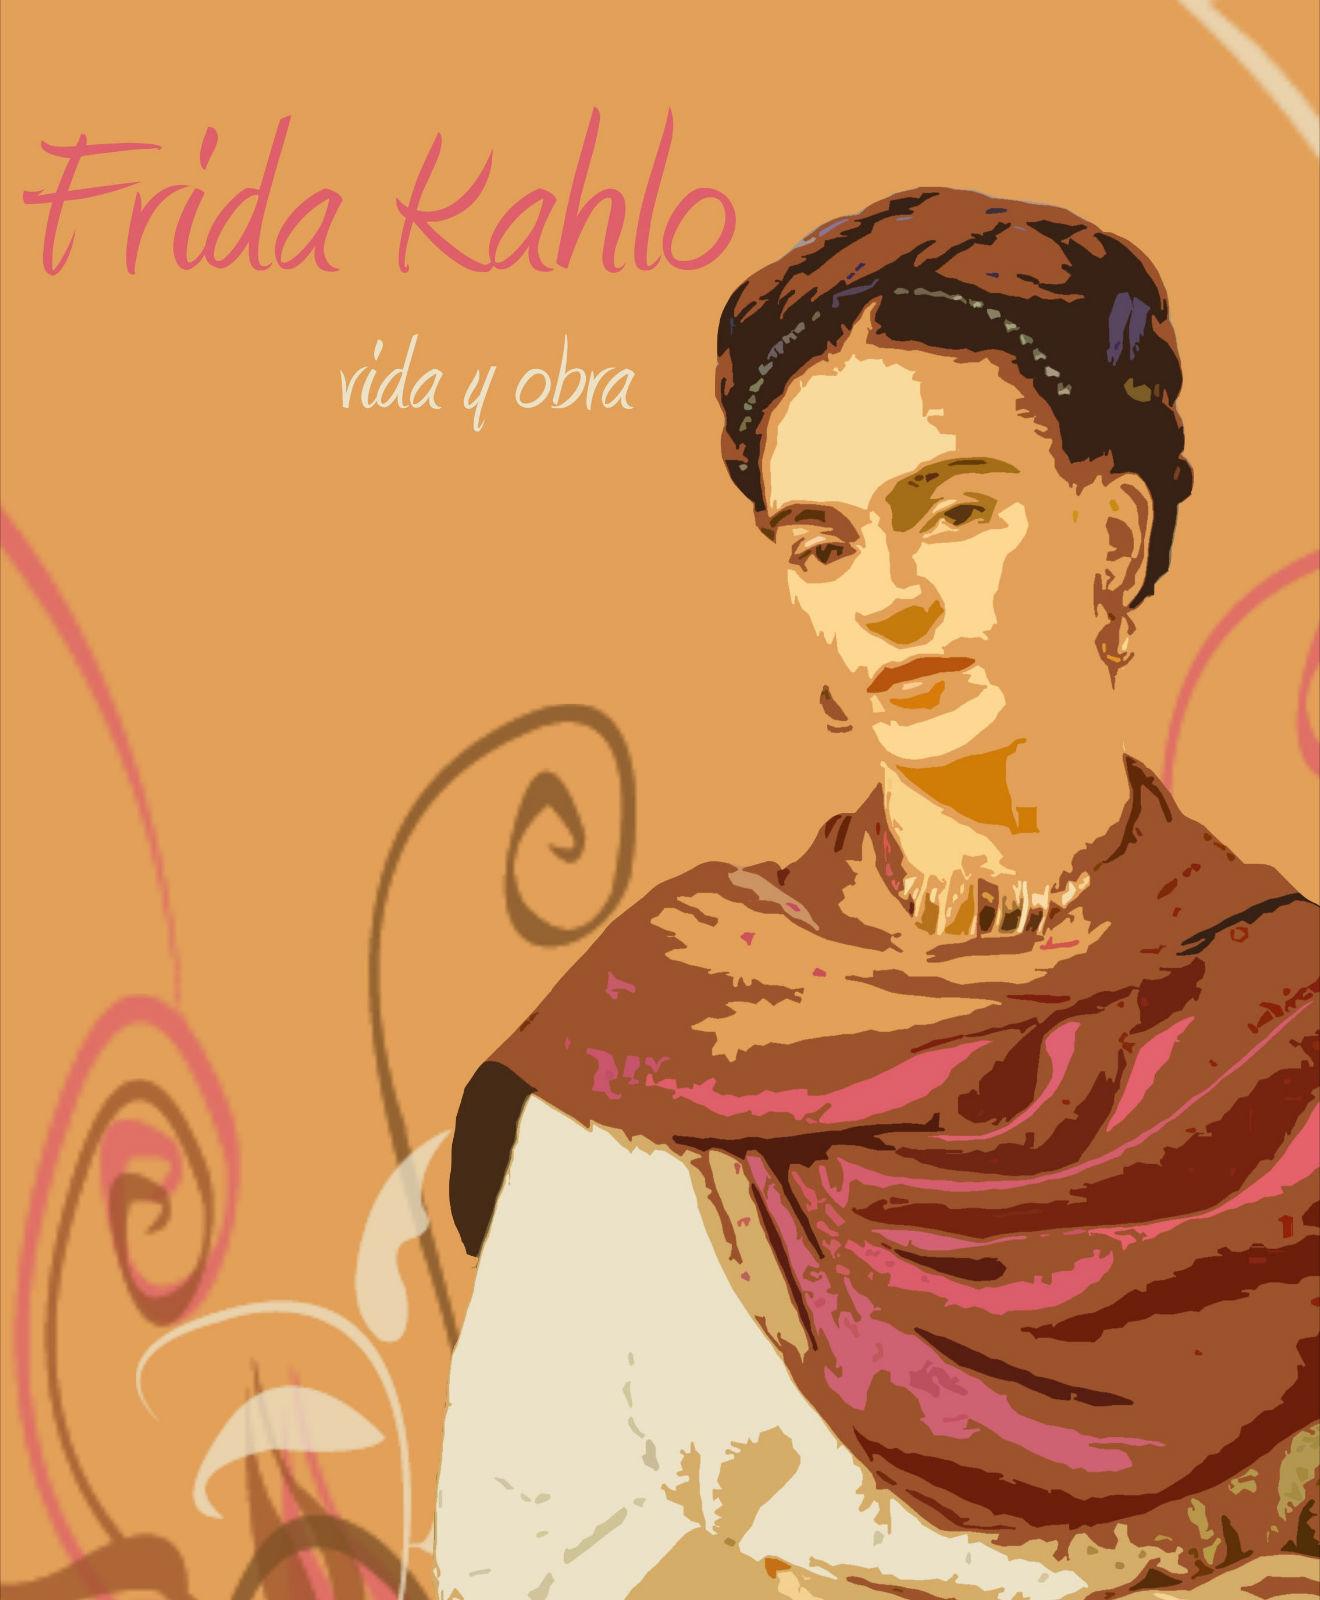 frida kahlo vida y obra: